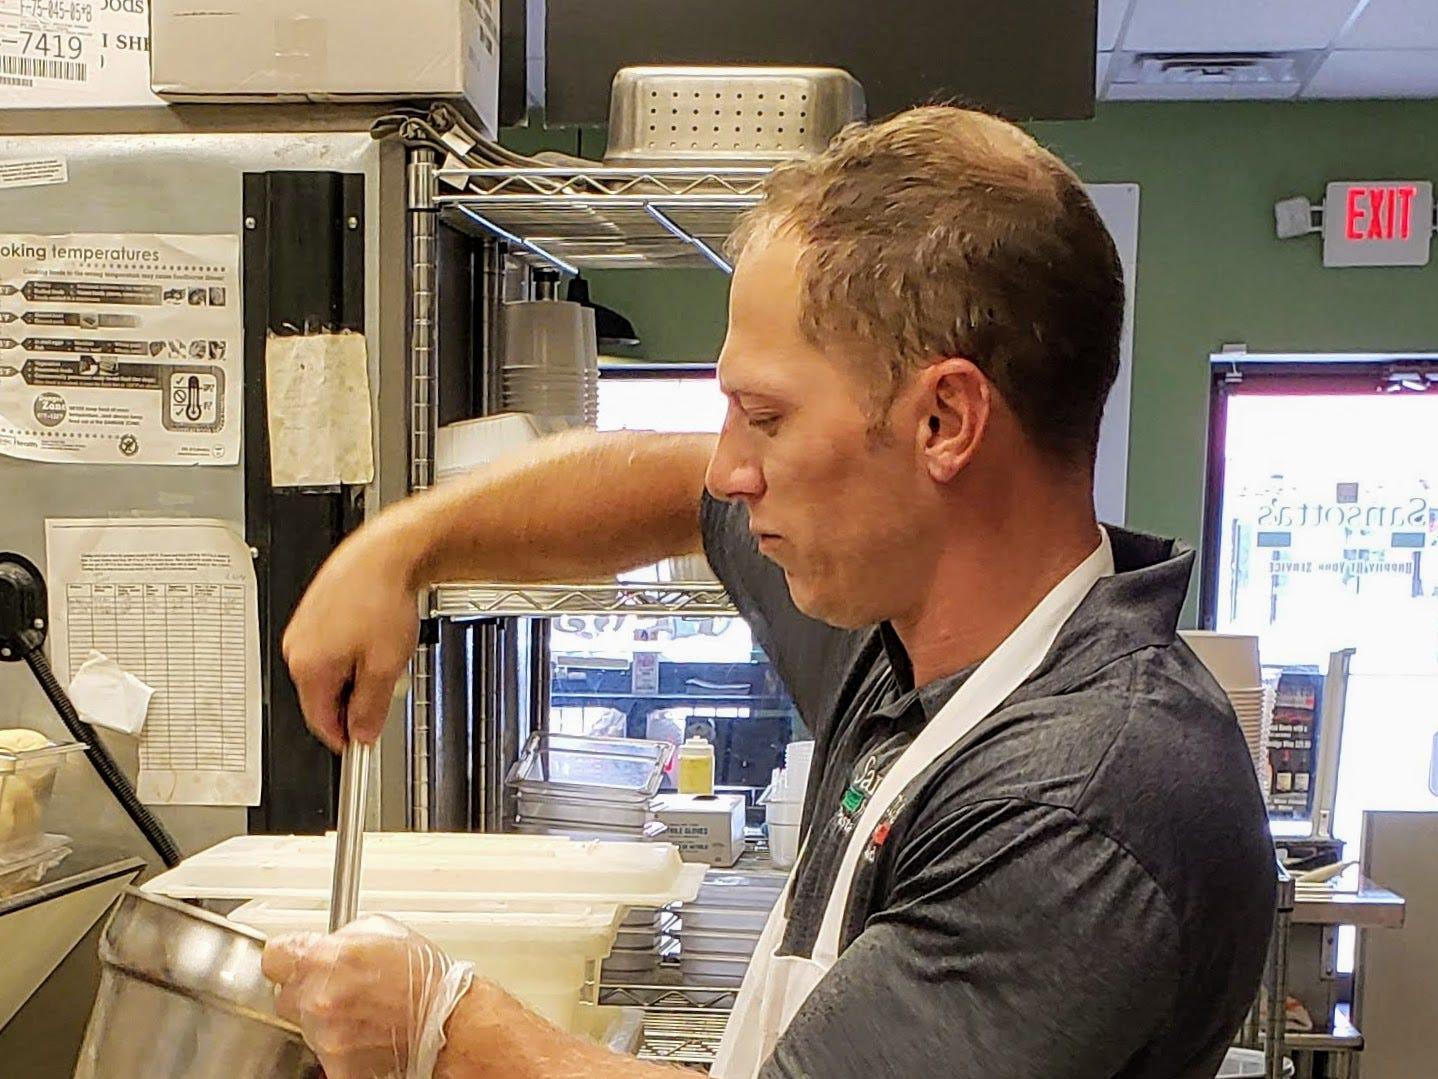 Ralph Cirillo III works in the kitchen at Sansotta's.